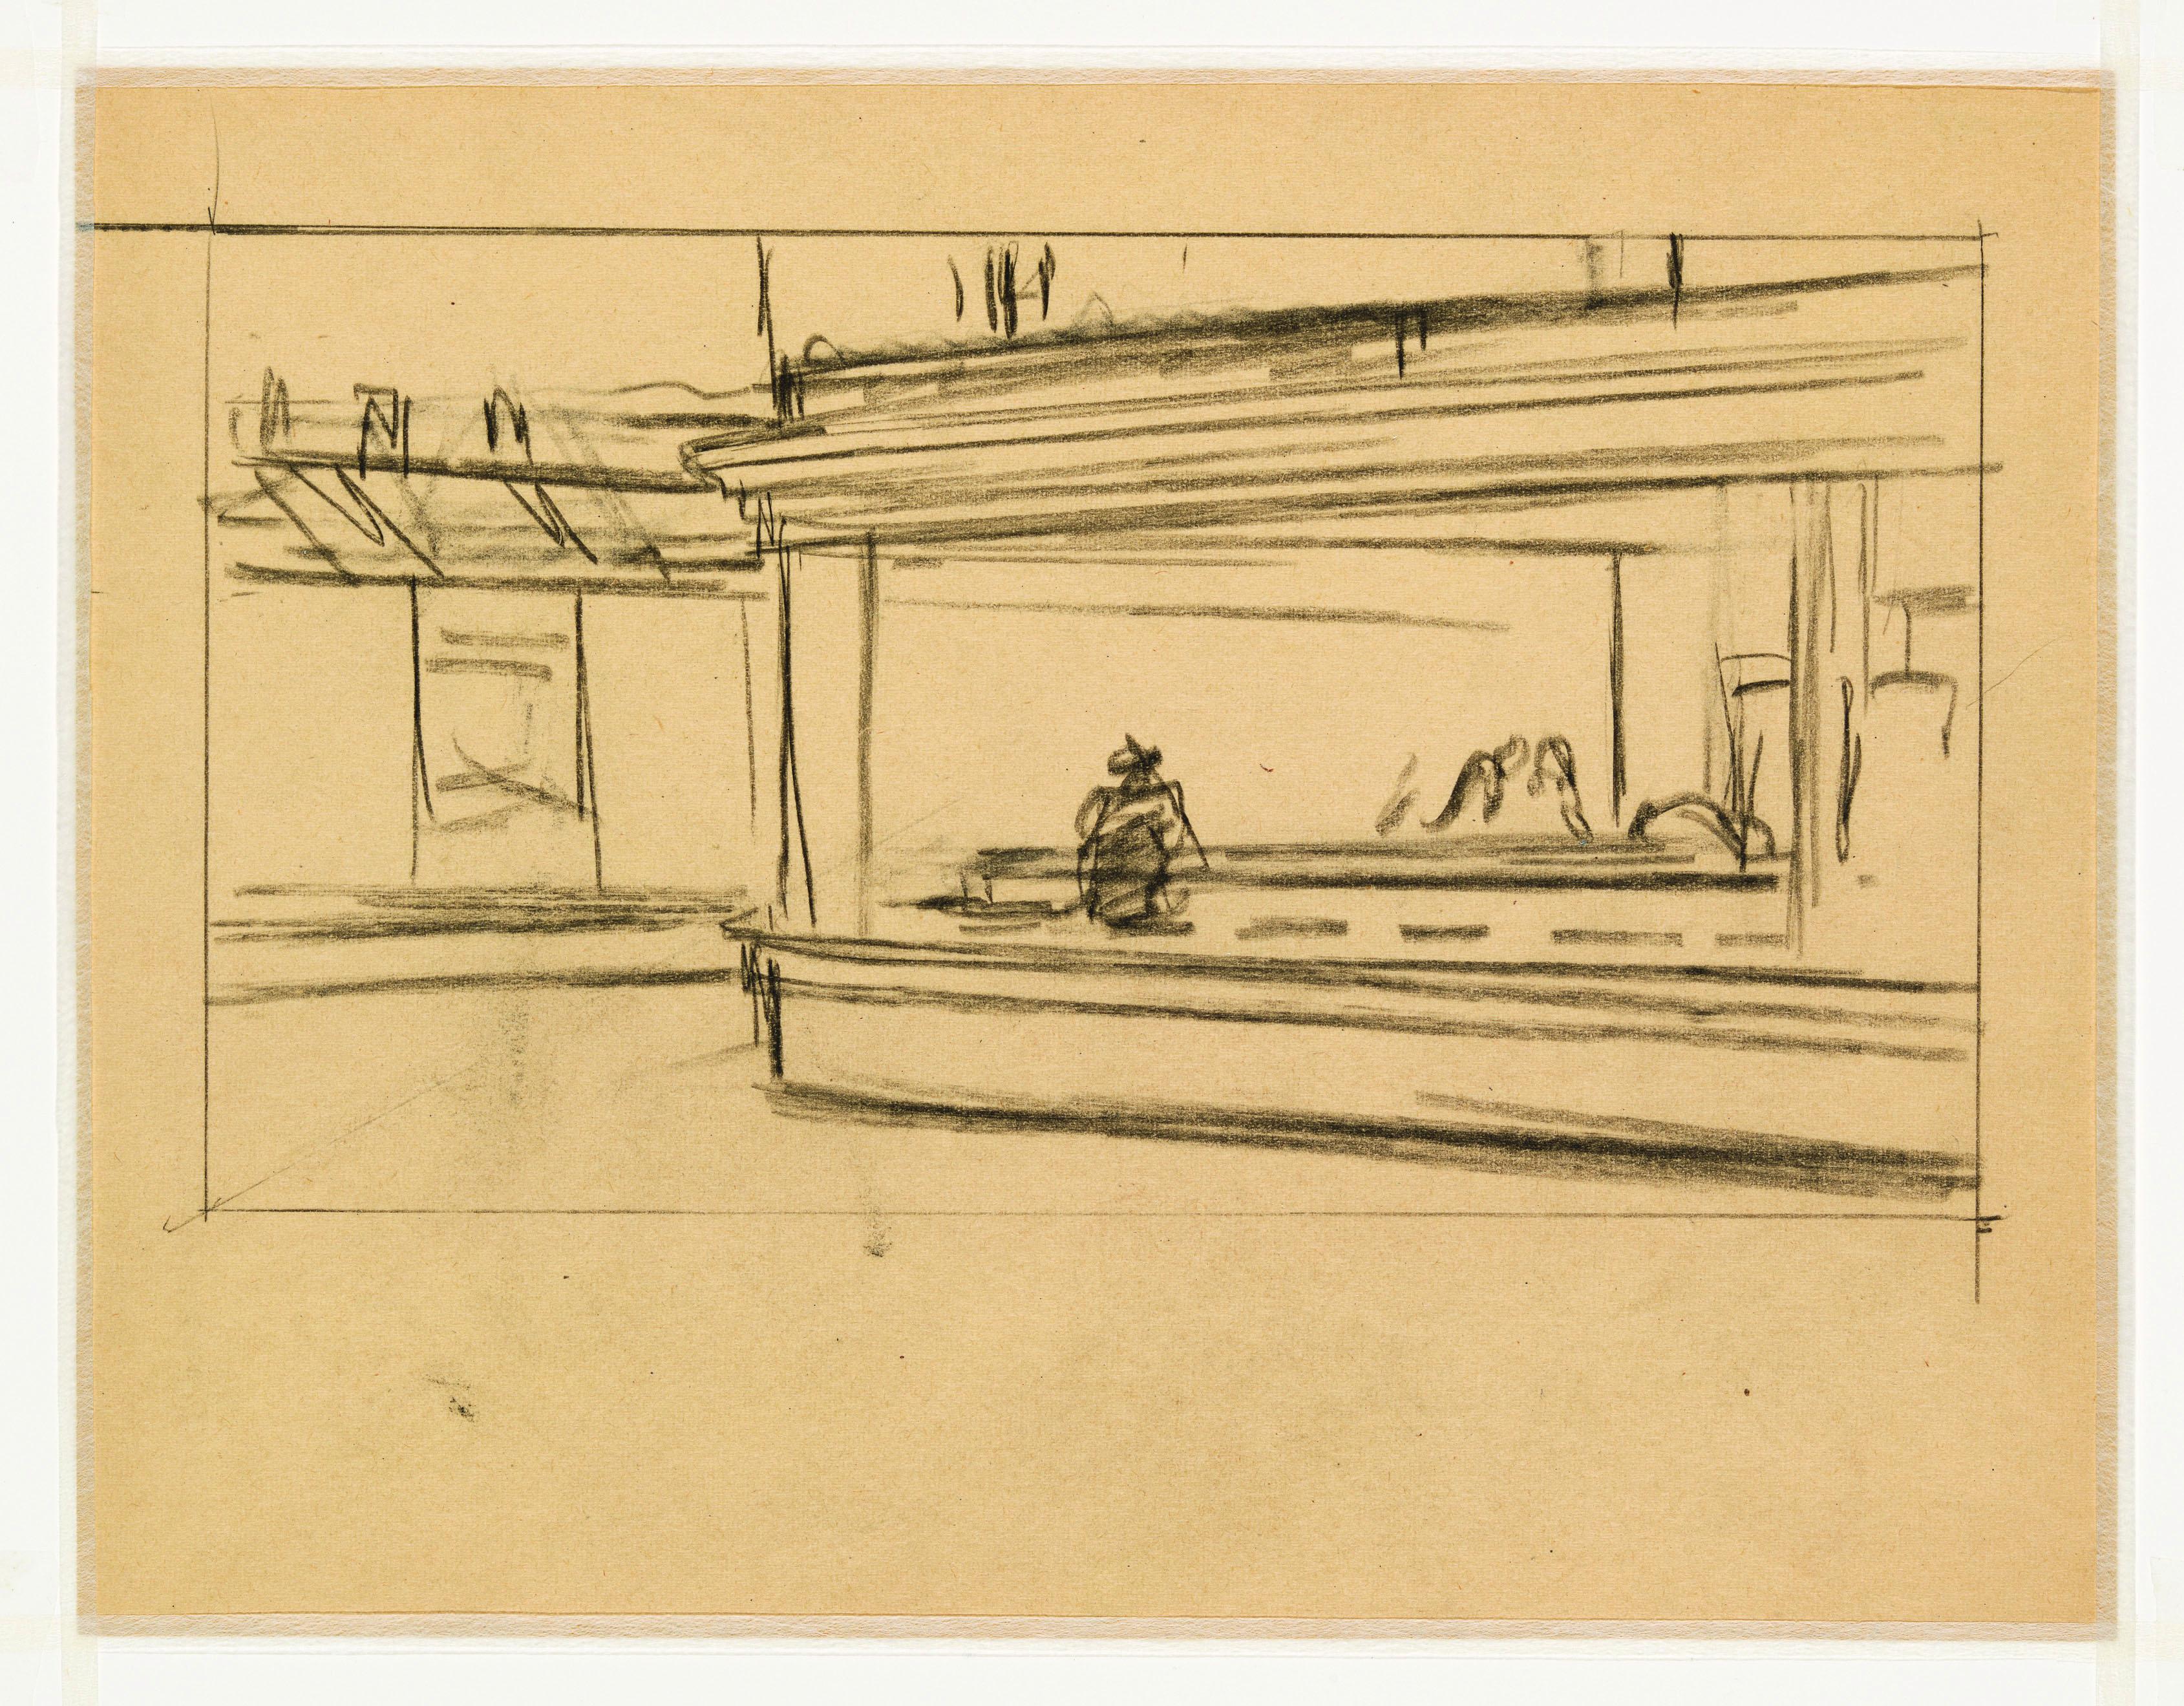 Biography of Edward Hopper